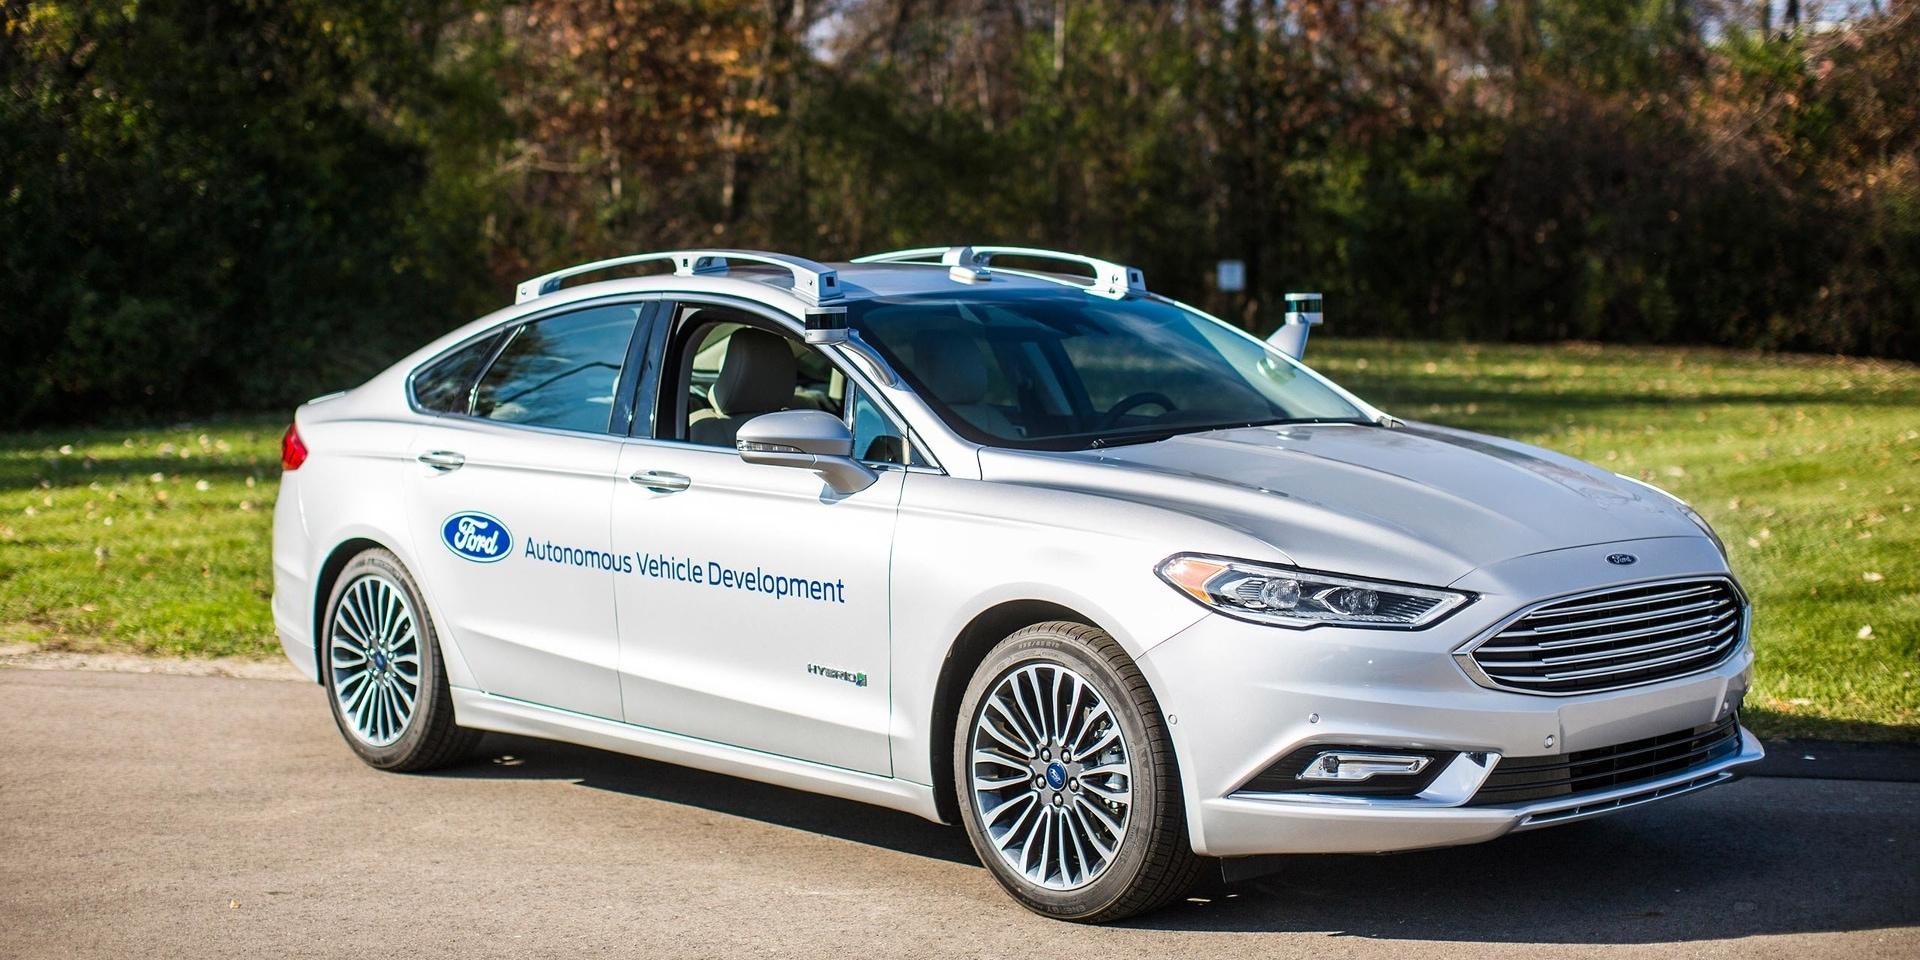 Ford自動駕駛科技領先群雄,但2026年才能買到全自動車輛